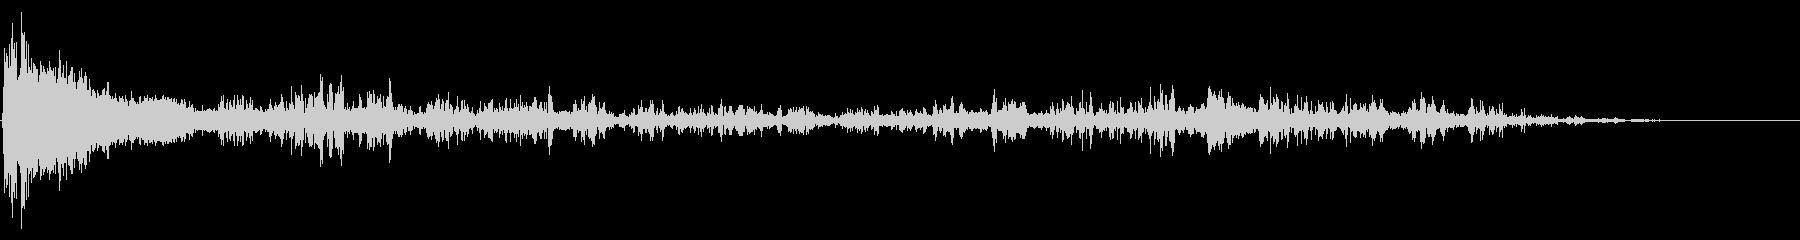 SynthHit EC03_16_2の未再生の波形